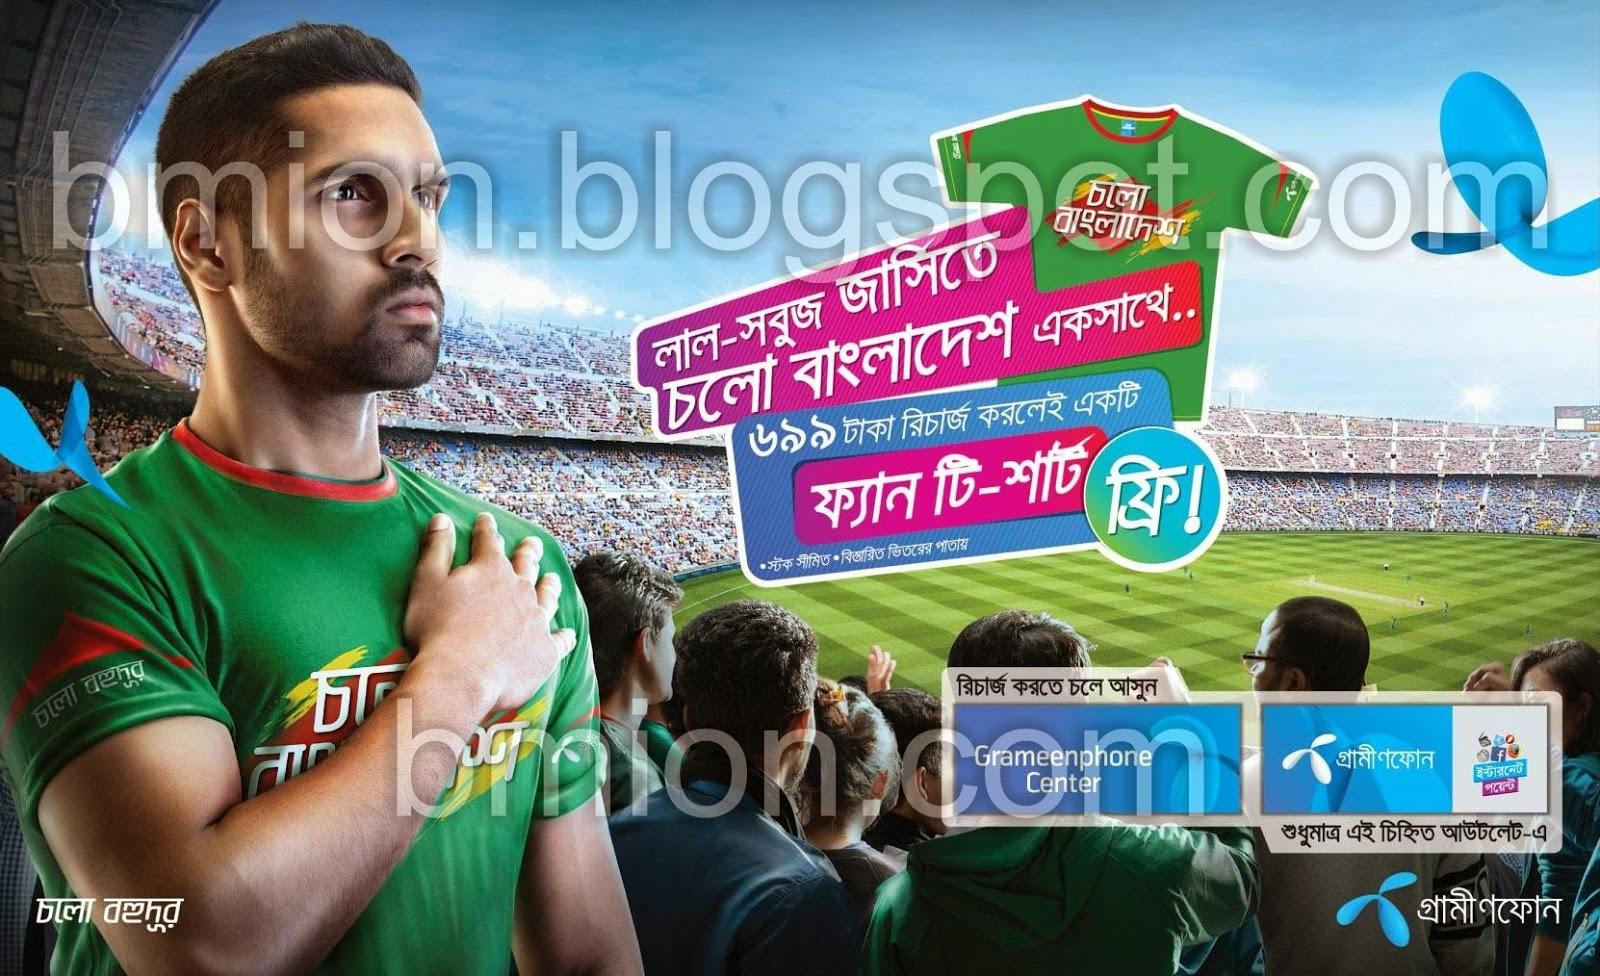 Grameenphone-Gp-699Tk-Recharge-Fan-TShirt-Free-Lal-Shobuj-Jersy-te-Cholo-bangladesh-eksathe